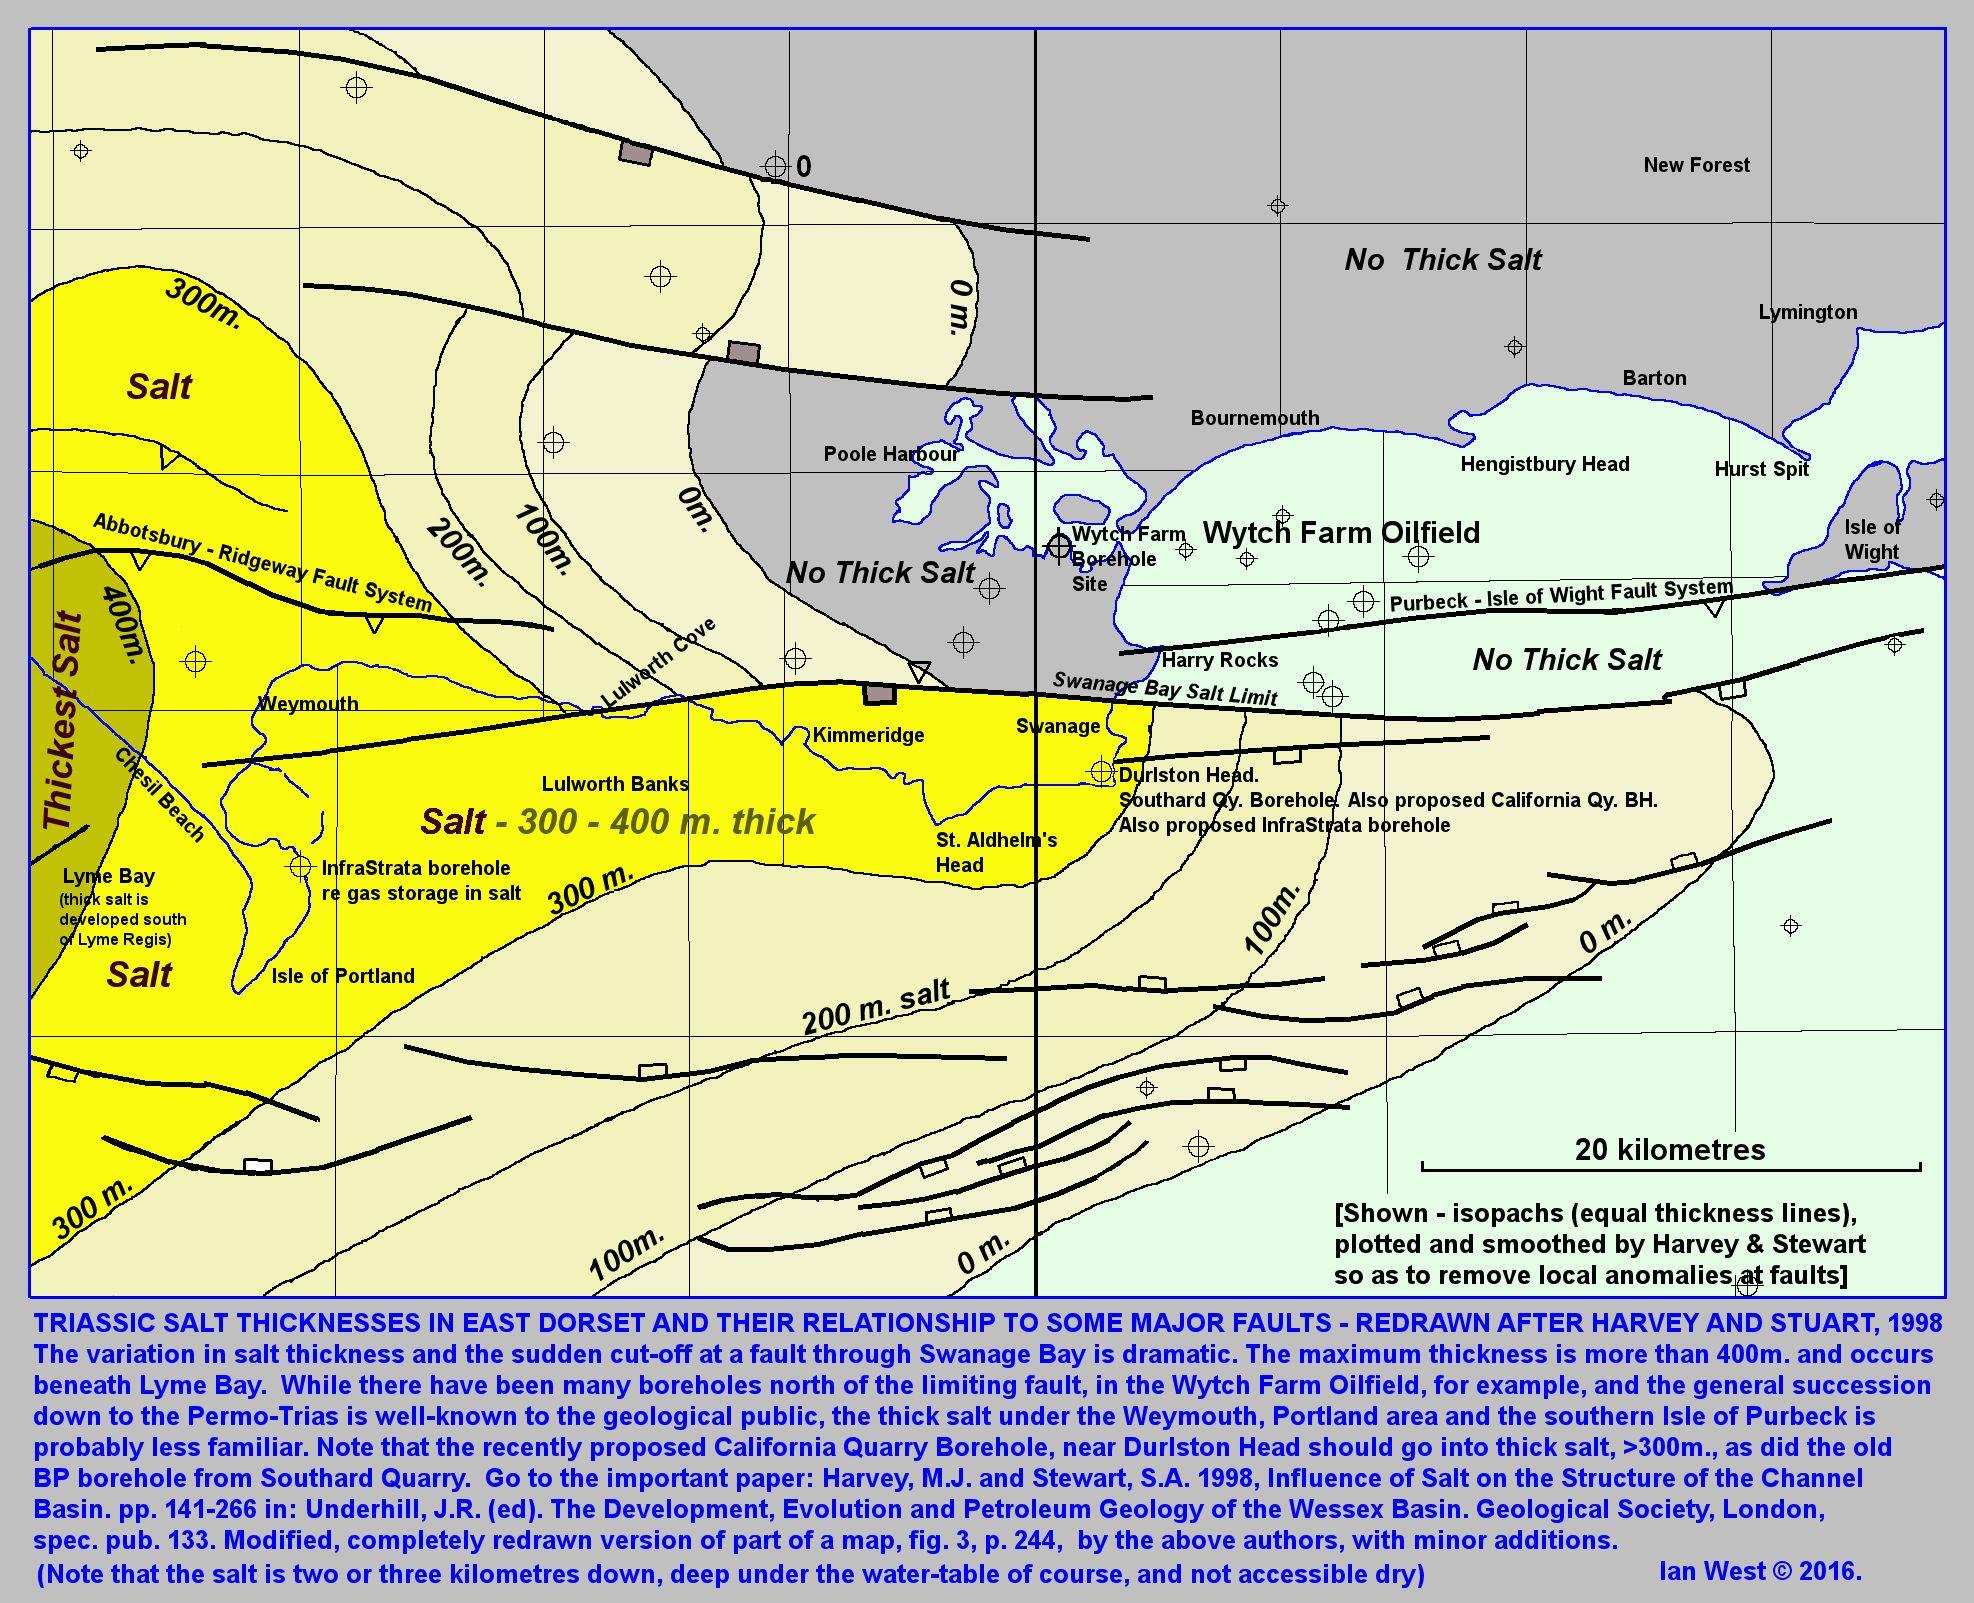 Petroleum Geology - the Portland - Isle of Wight Basin